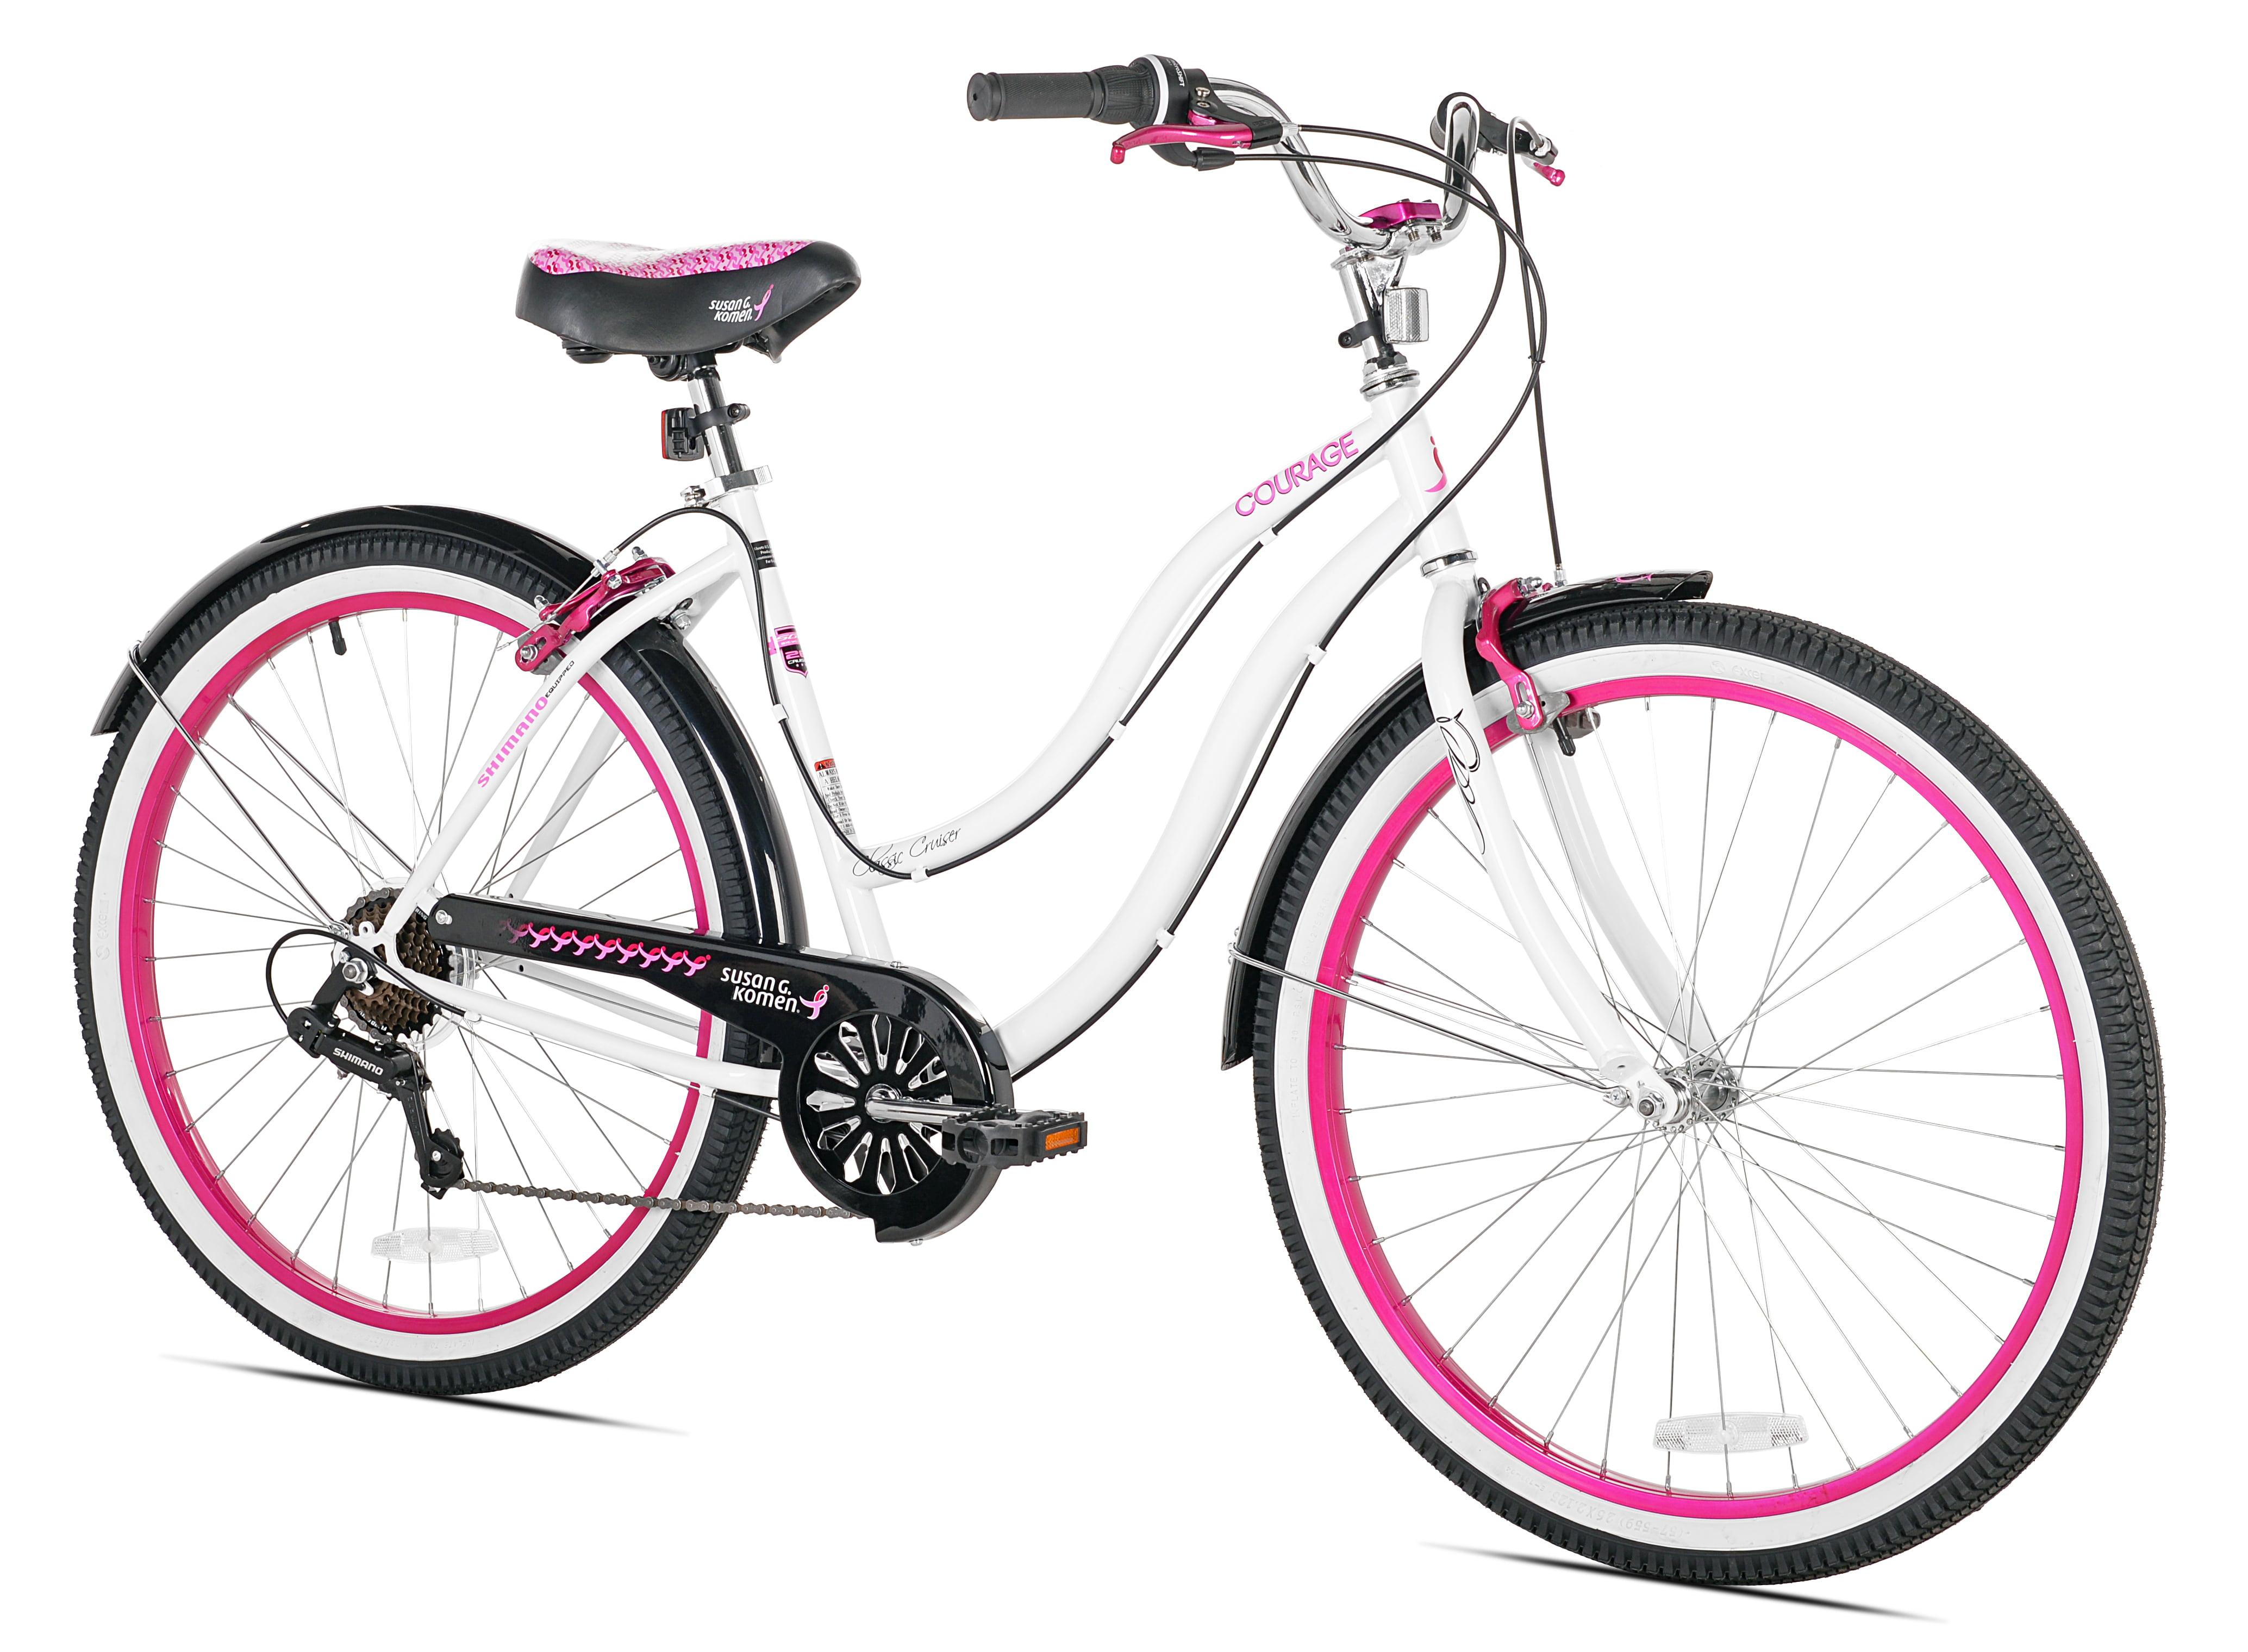 Susan G Komen 26 Cruiser Women S Bike White Pink Walmart Com Walmart Com